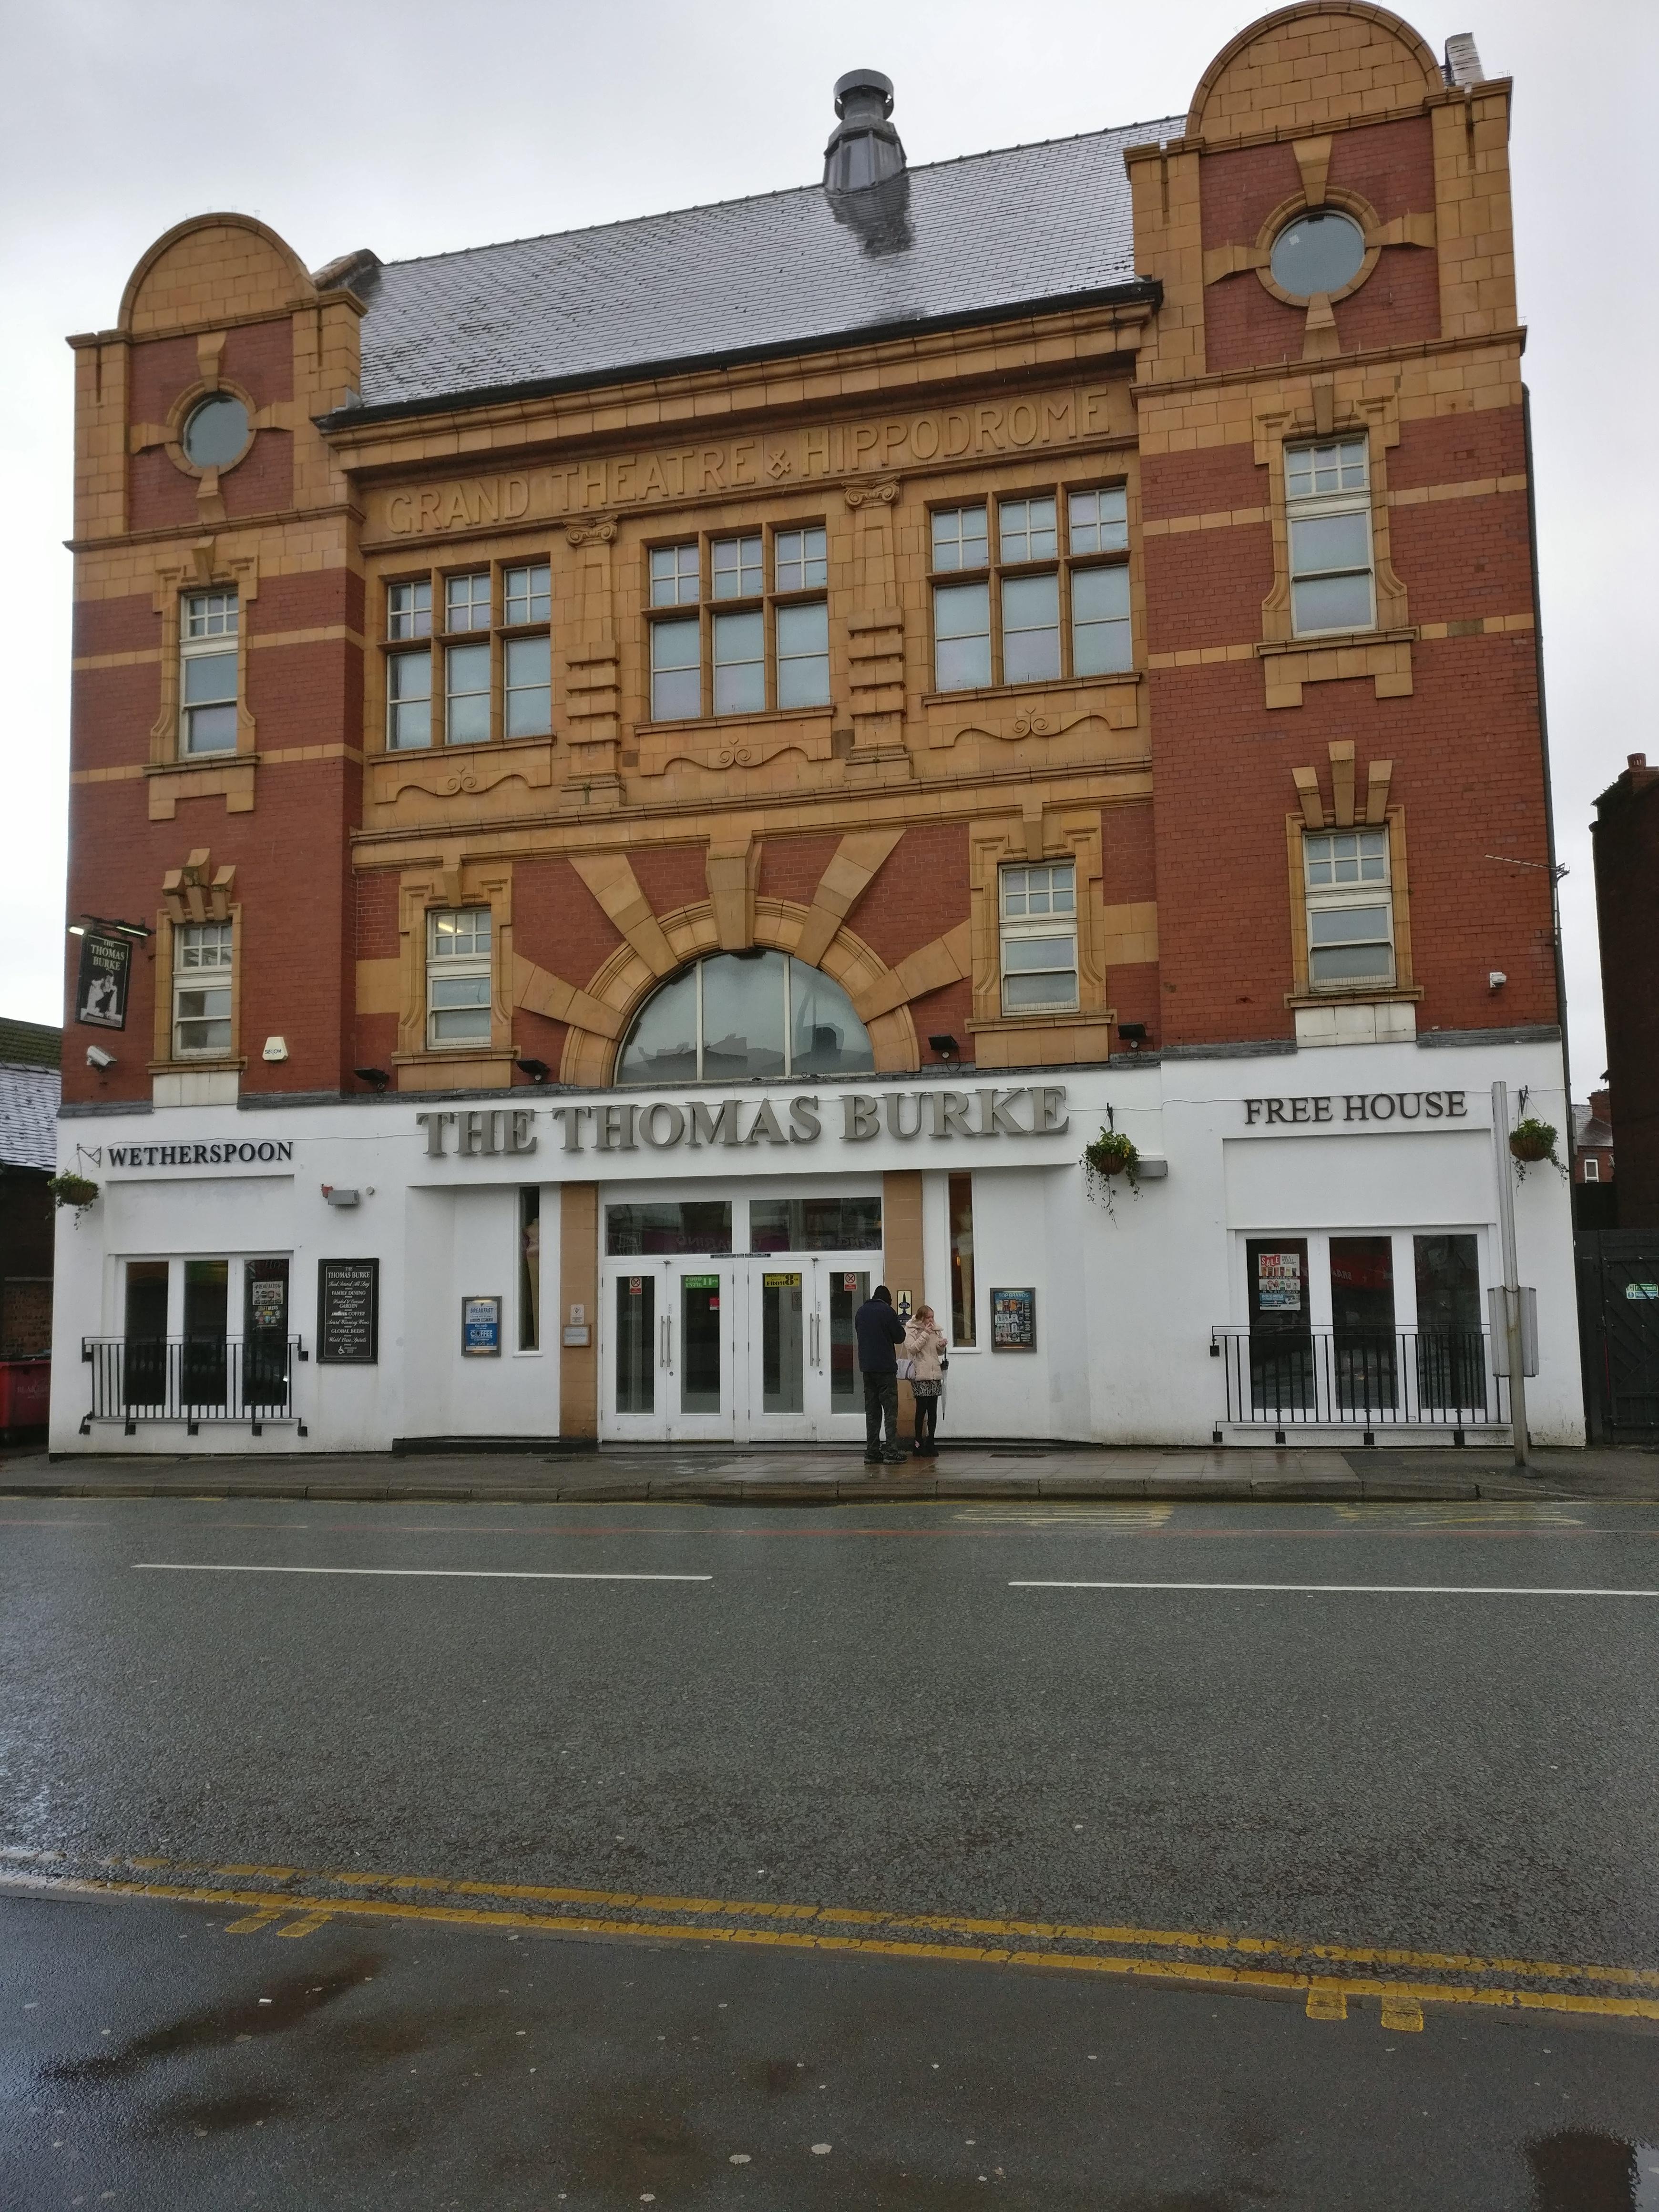 File:Tom burke pub jpg - Wikimedia Commons